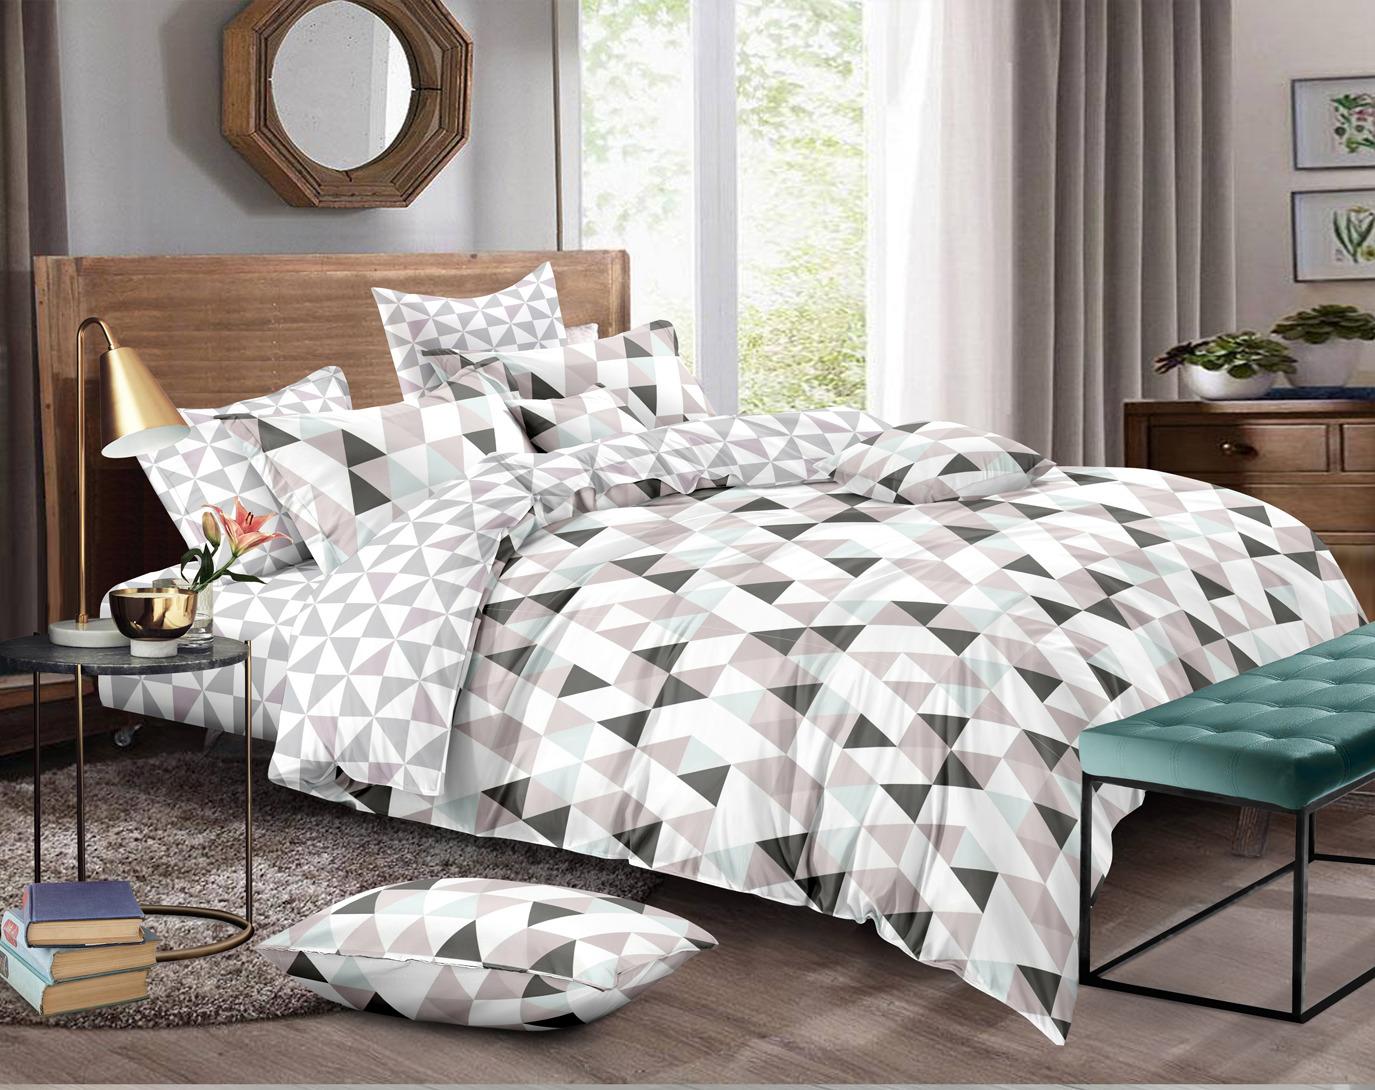 цена Комплект постельного белья Amore Mio Gold Miles, 7851, серый, евро, наволочки 50x70, 70x70 онлайн в 2017 году